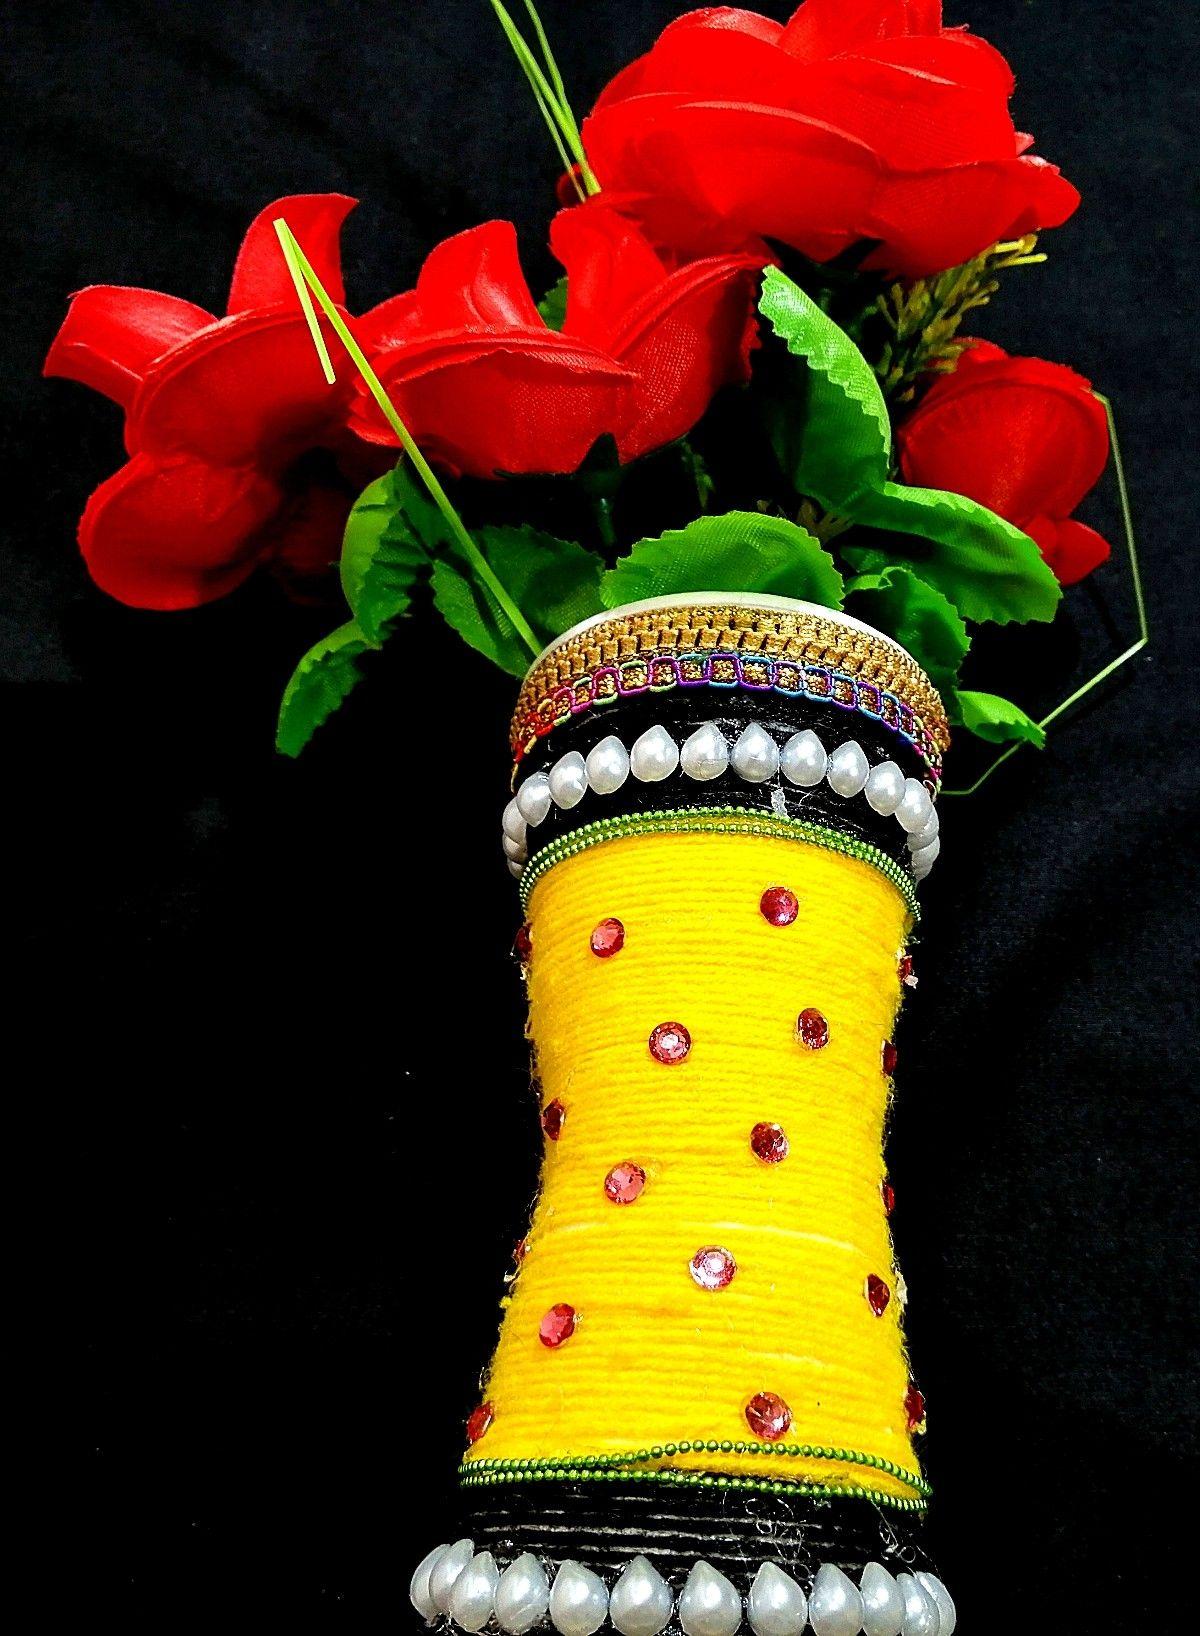 Flower Disposal Craft Flowers Vase Pot Making Guldasta Banane Ka Tarika Home Decorating Diy Flower Vases Crafts Diy Decor